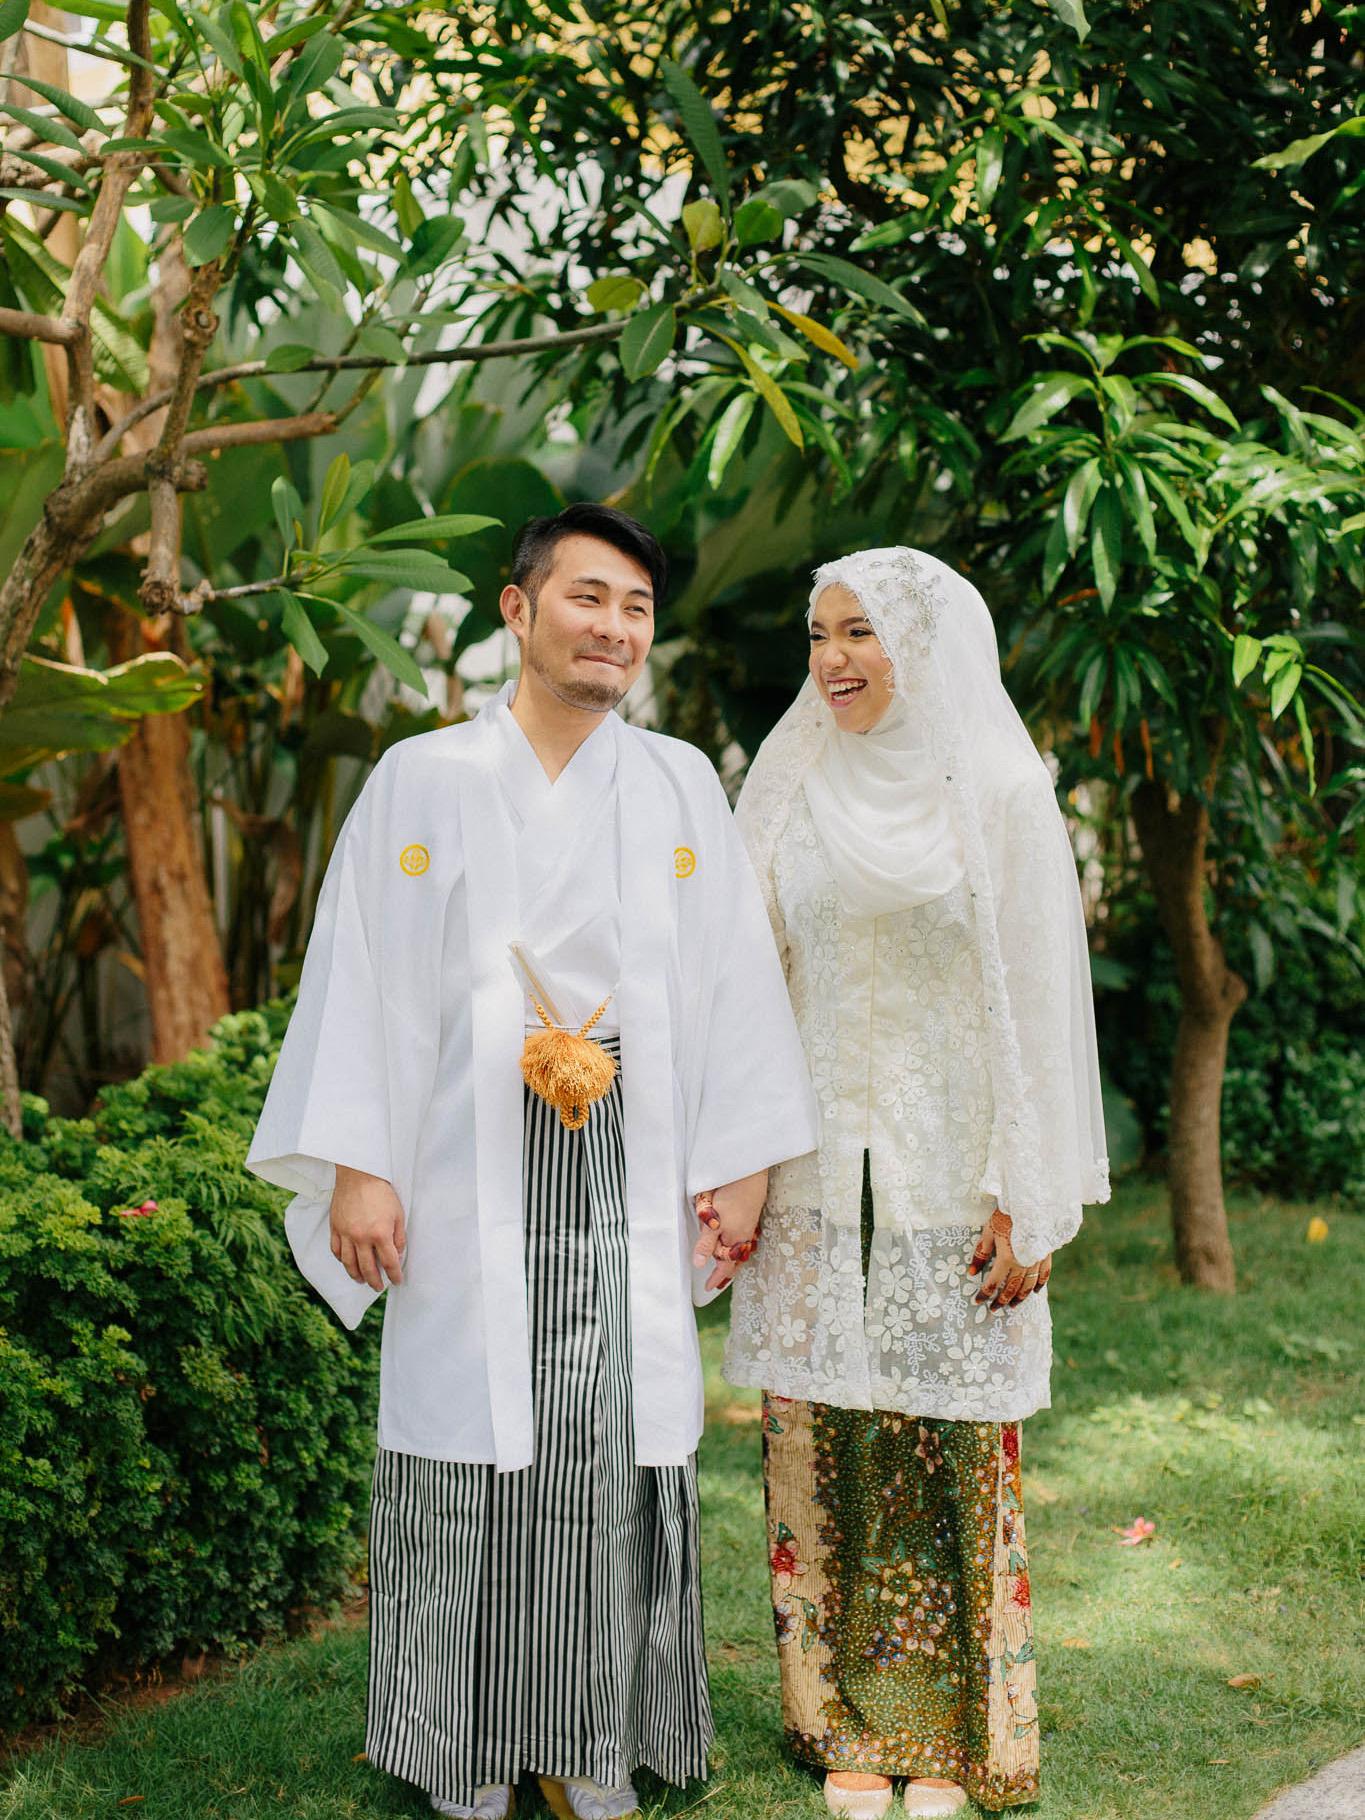 singapore-wedding-photographer-malay-indian-pre-wedding-travel-wmt-2015-20.jpg